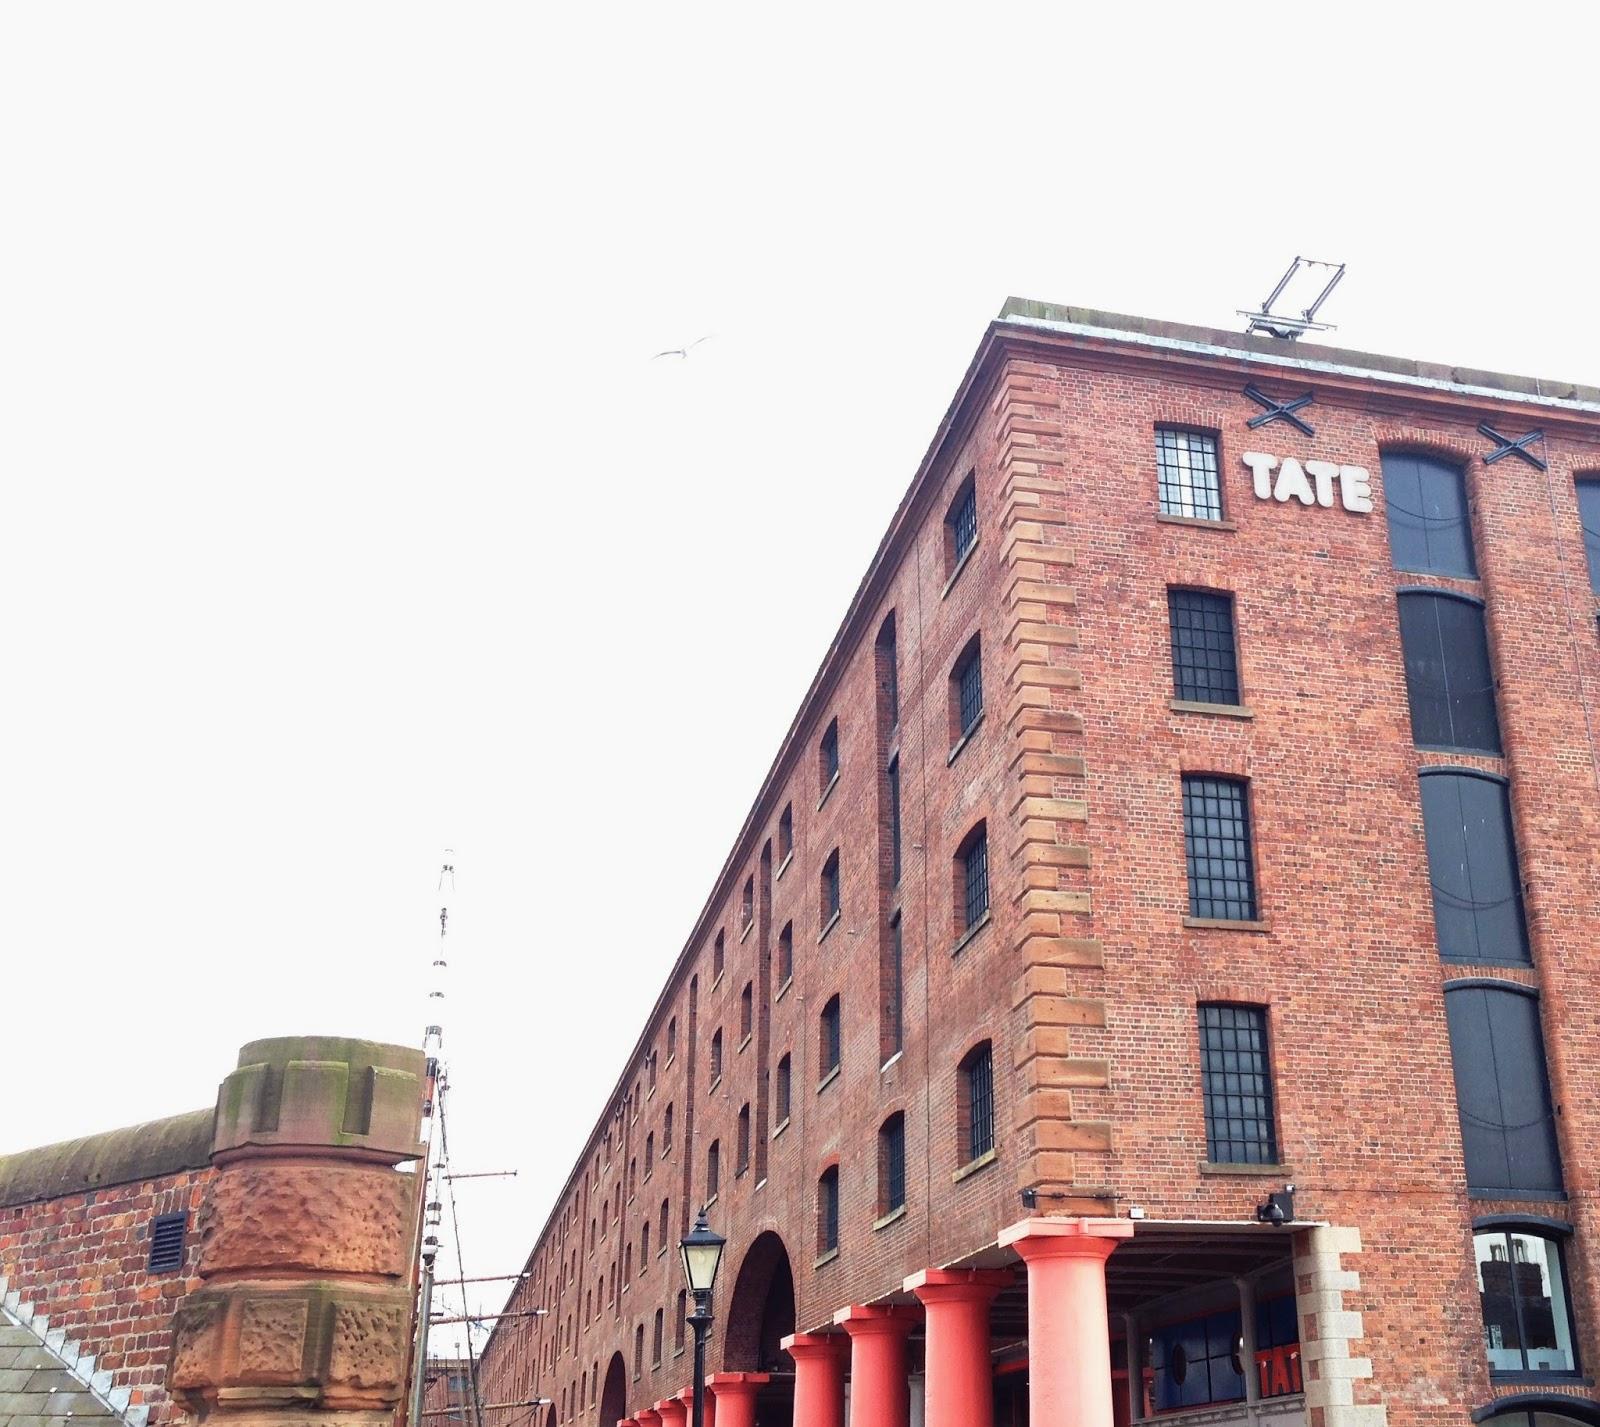 TATE Liverpool Albert Dock